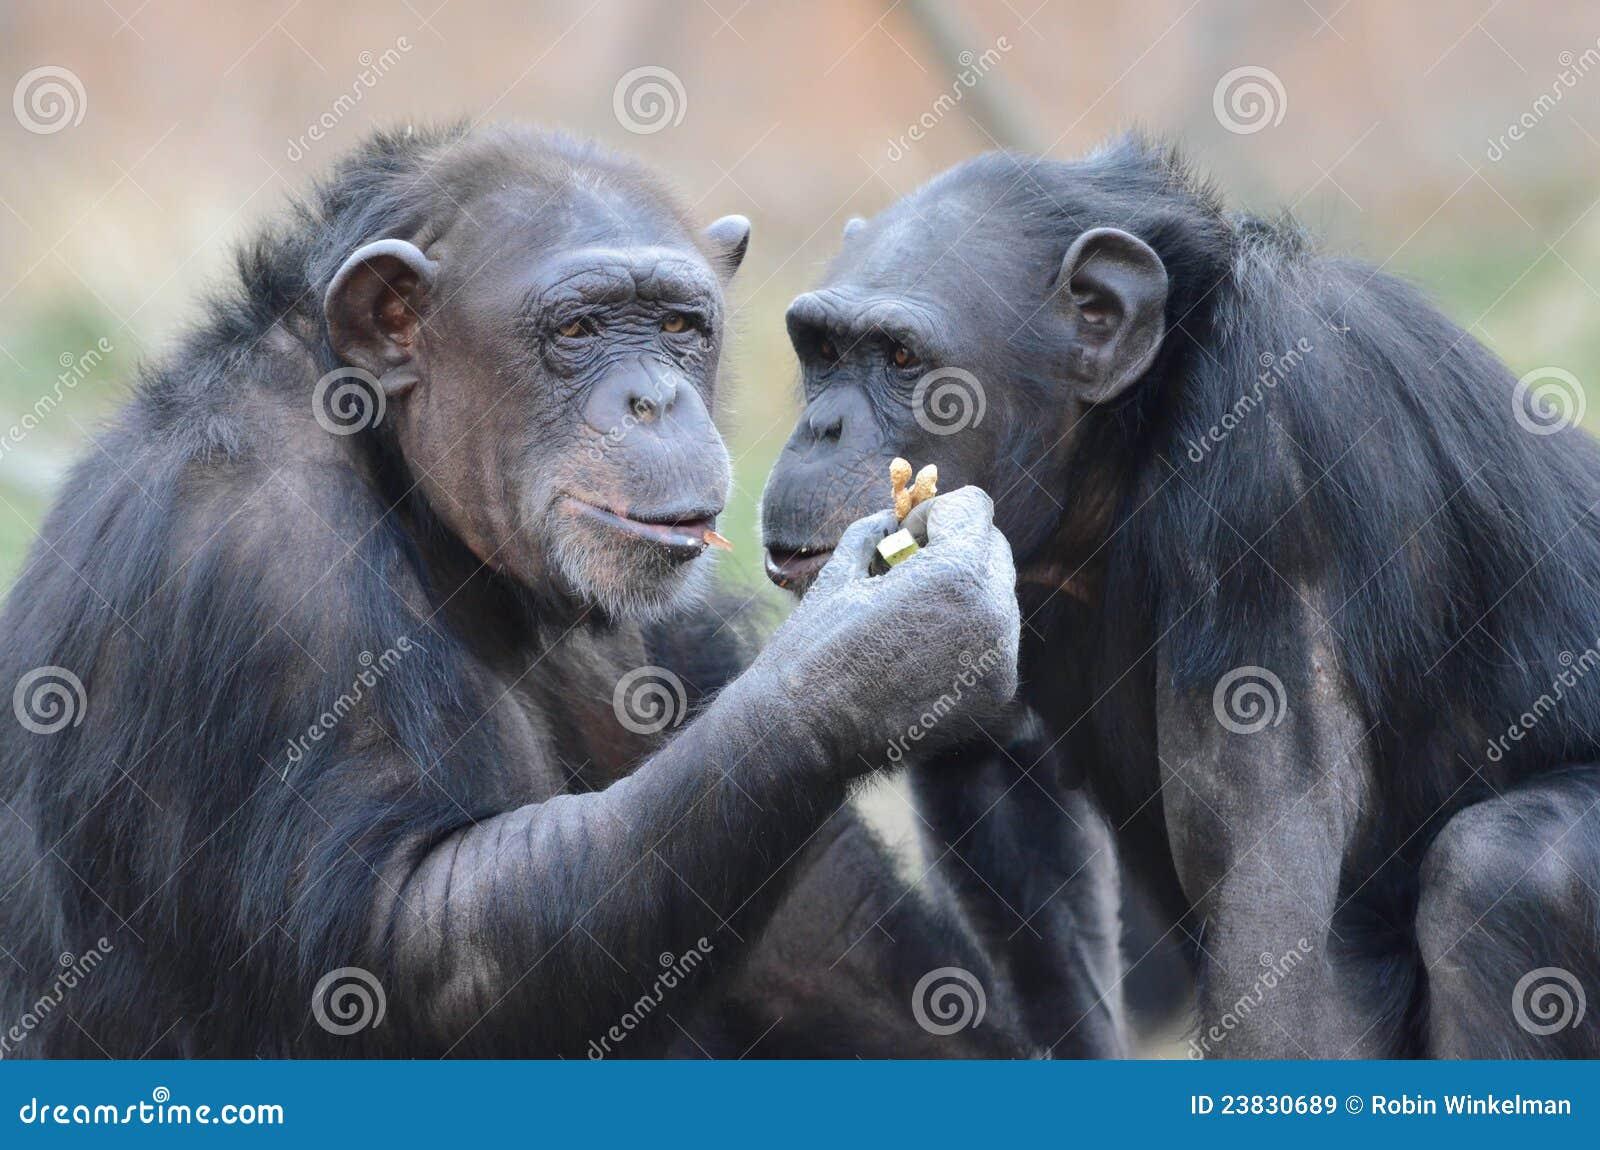 Chimps eating peanuts2